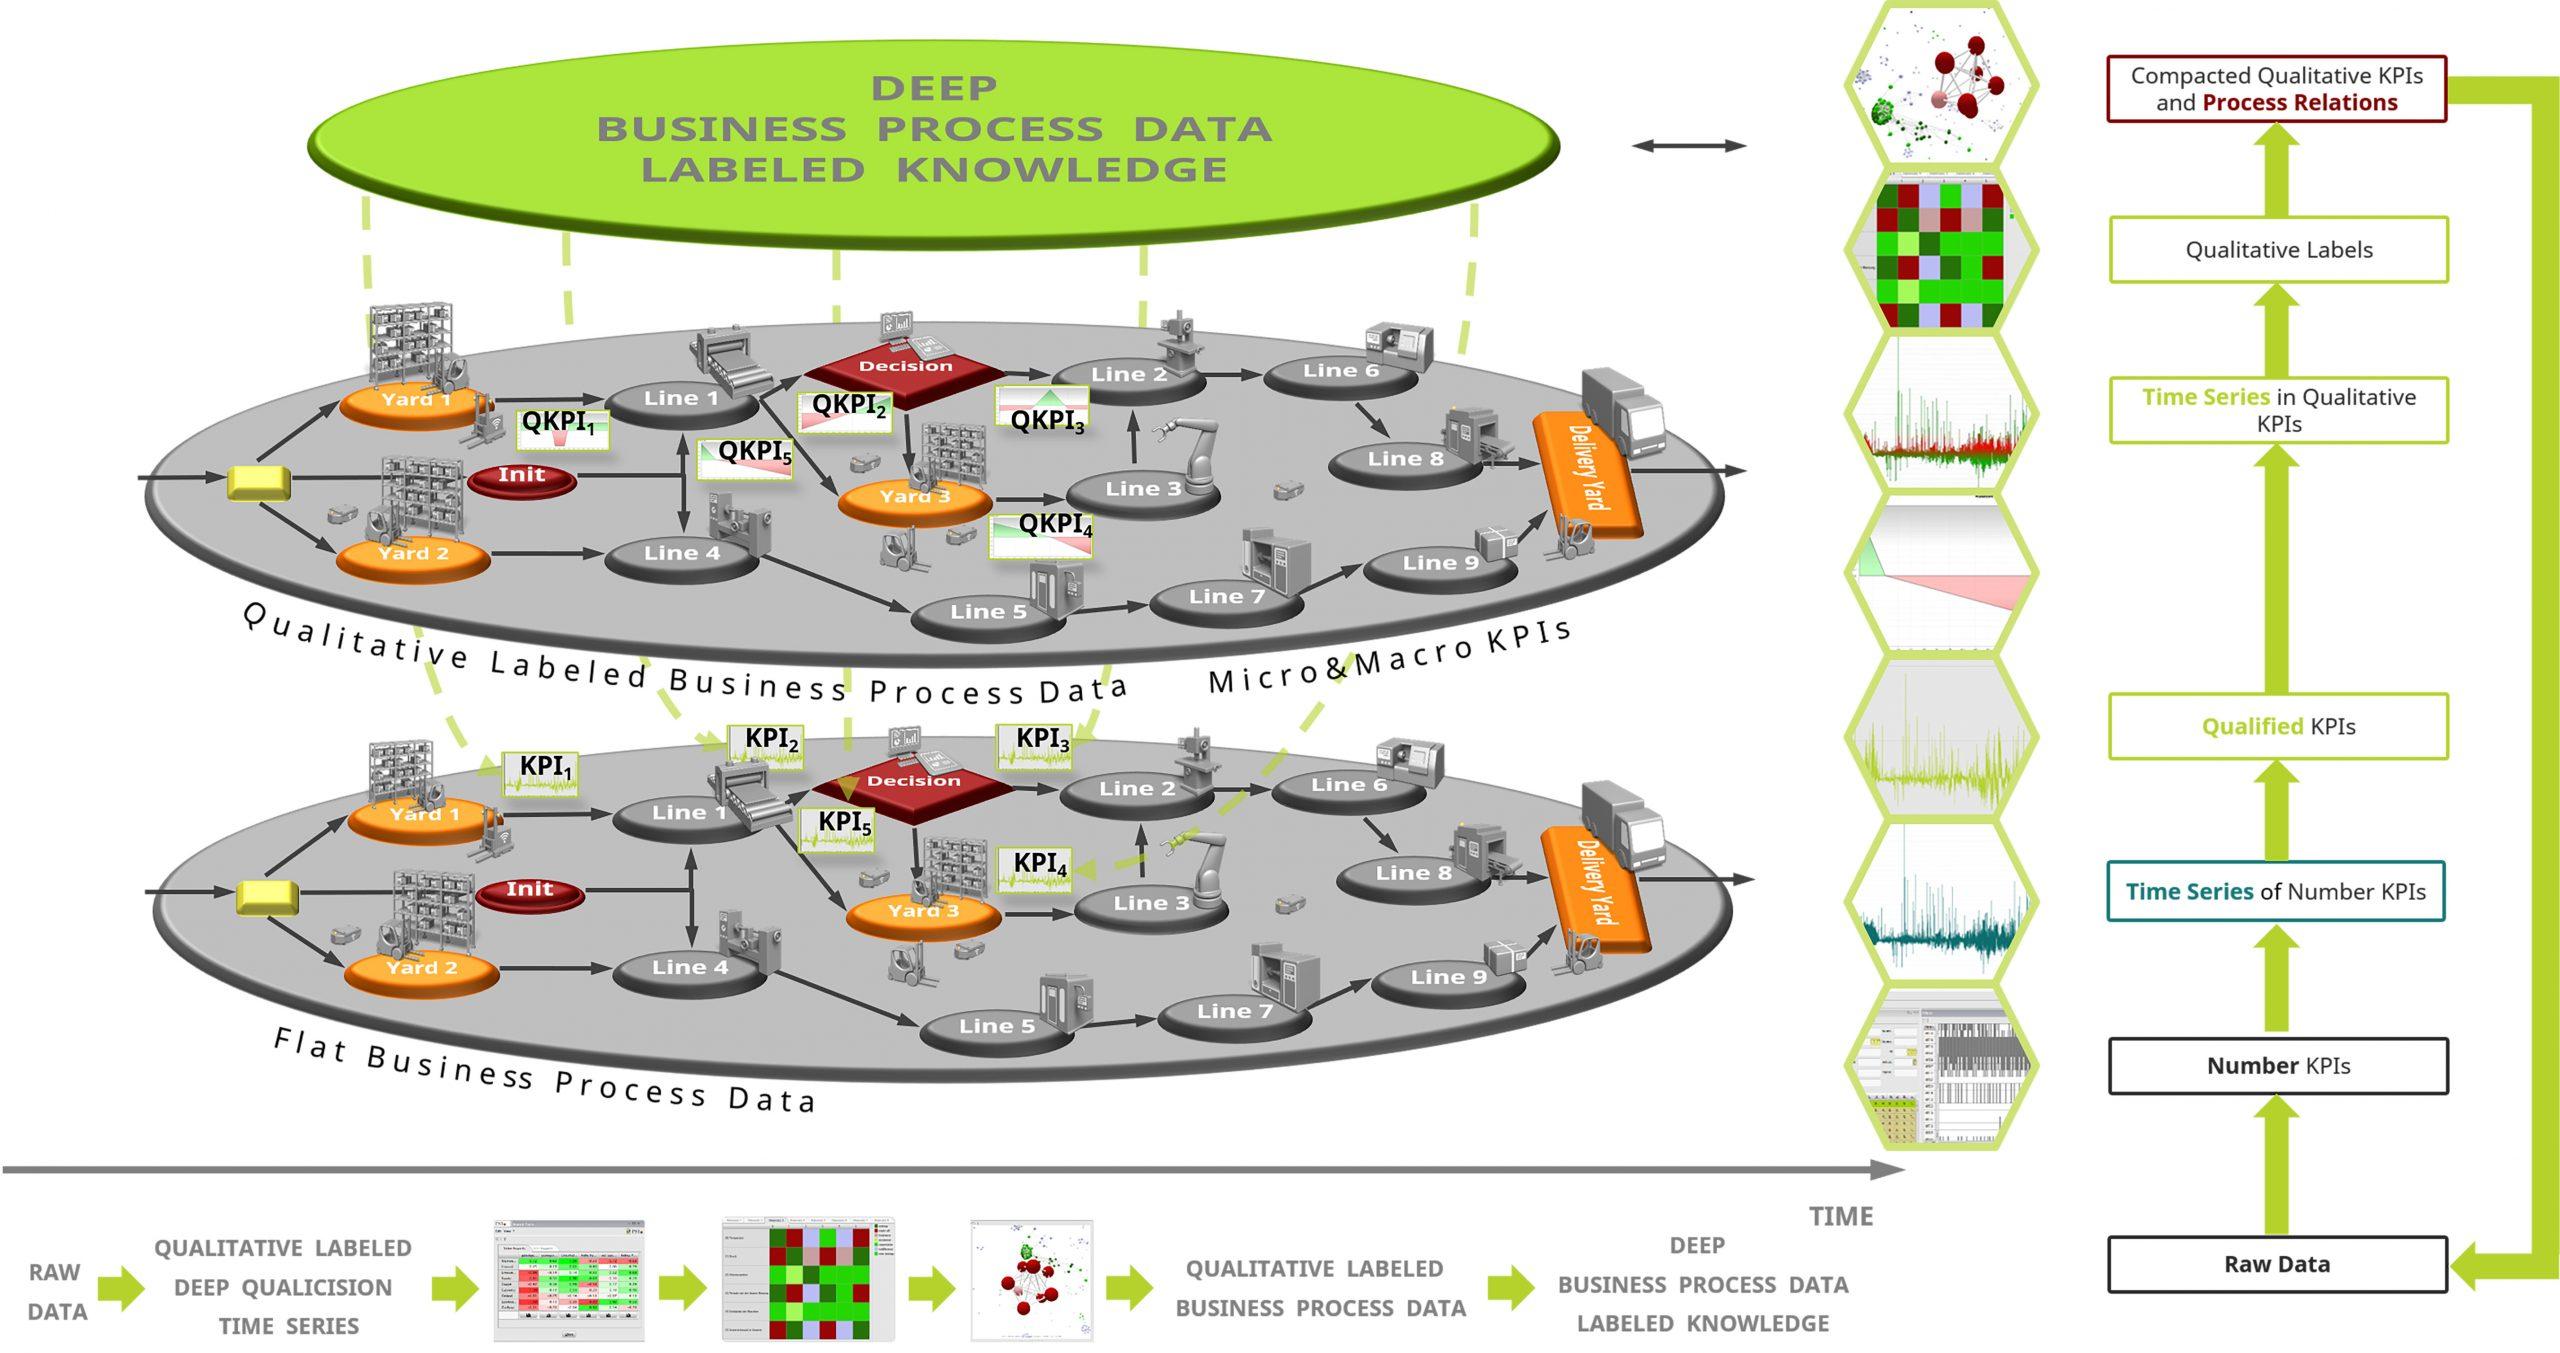 Layer-Modell Qualitatives Labeln (Bild: PSI FLS Fuzzy Logik & Neuro Systeme GmbH)